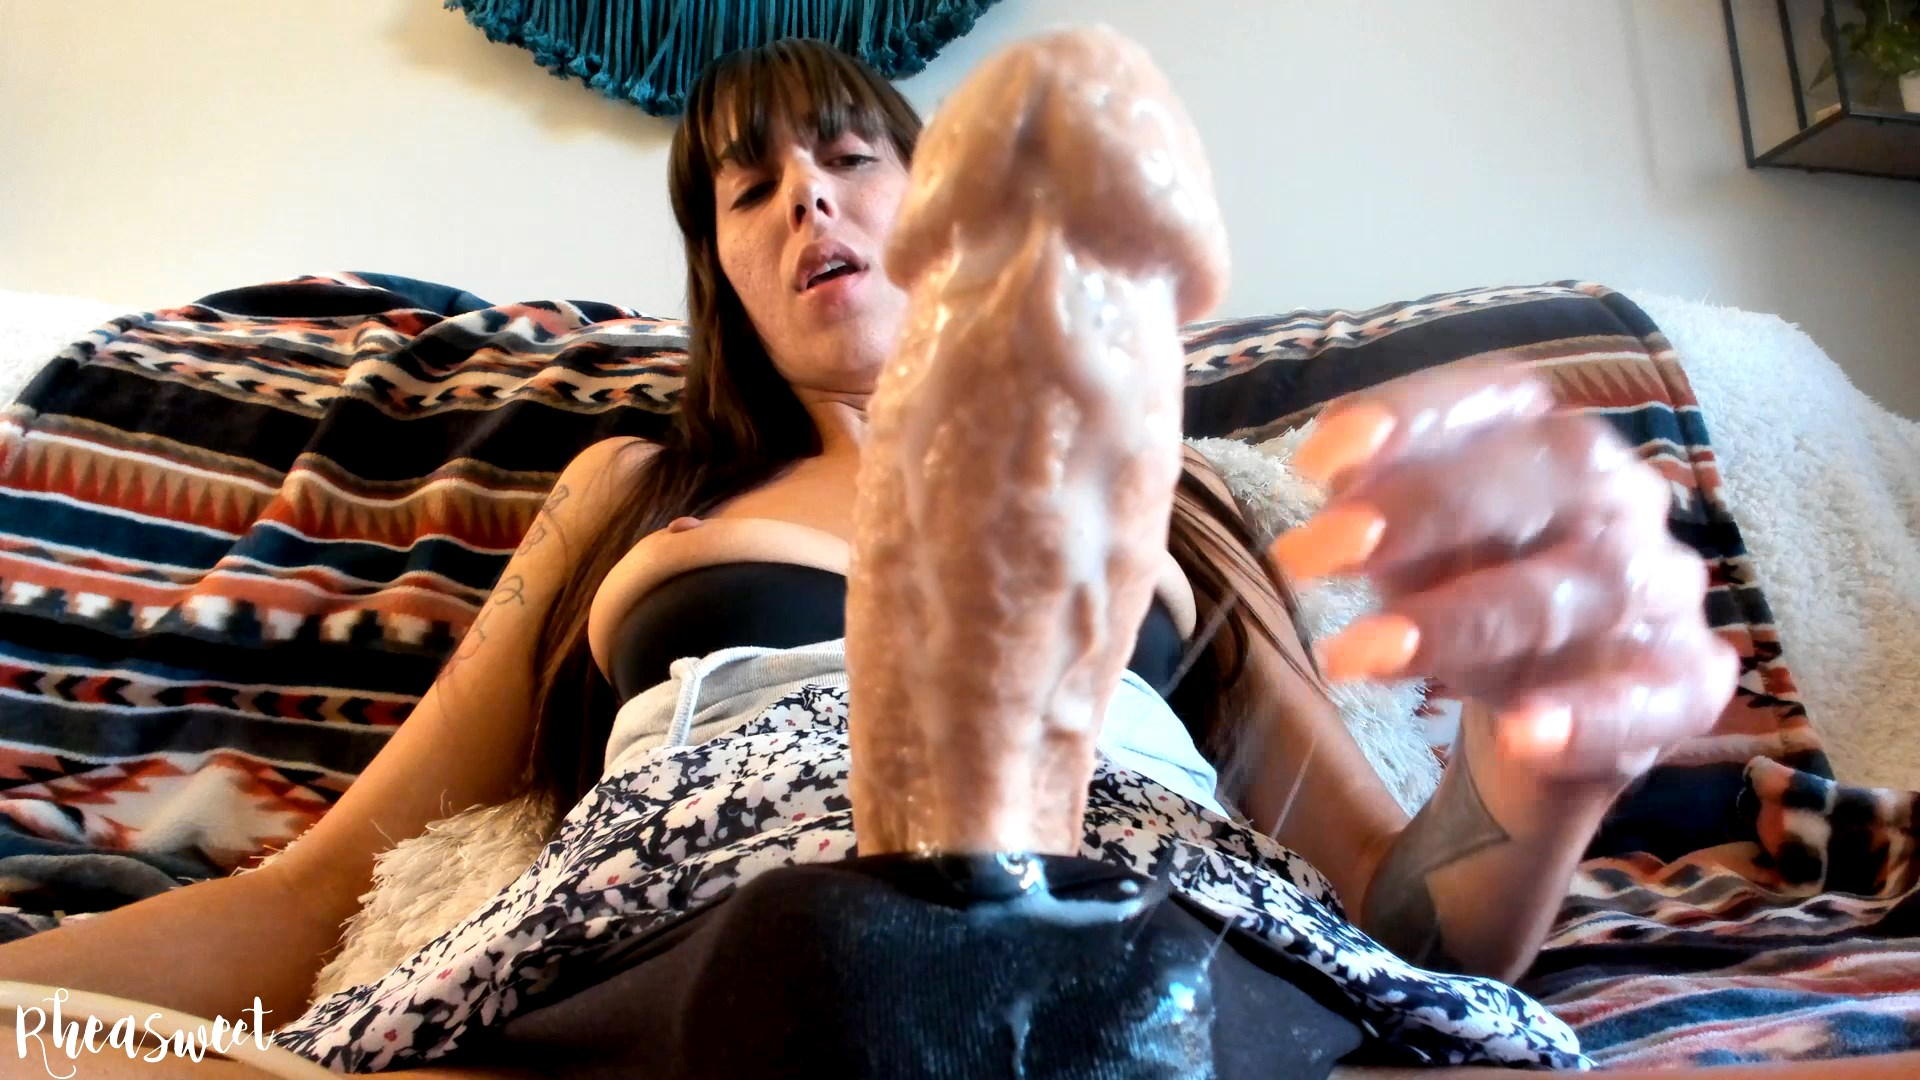 Rhea Sweet - Son Sucks Mommy's Cock